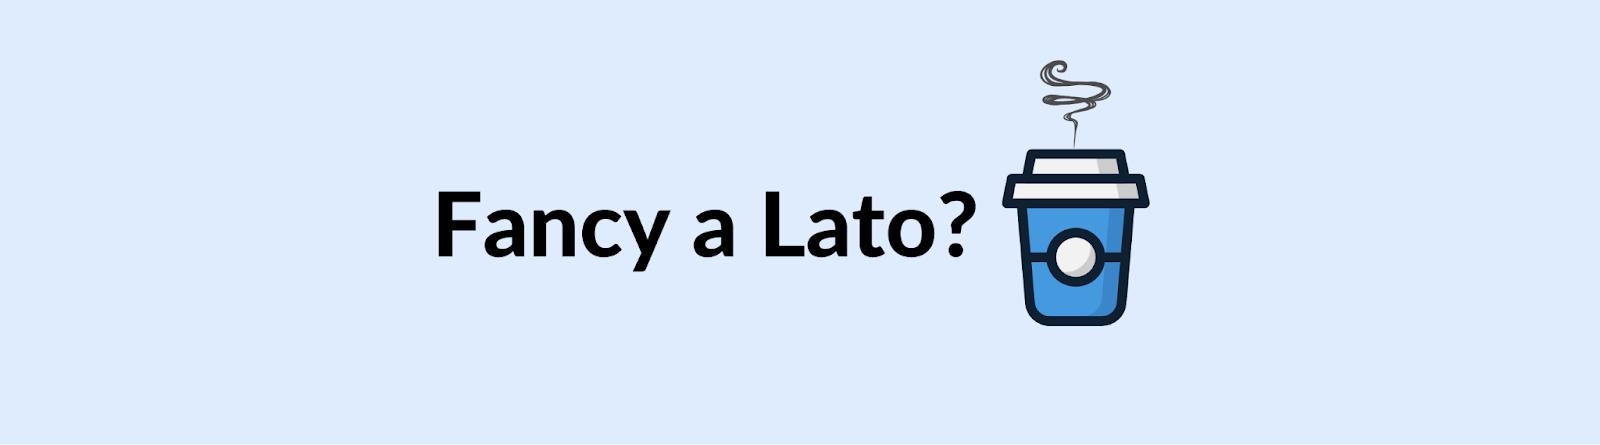 Lato email design font